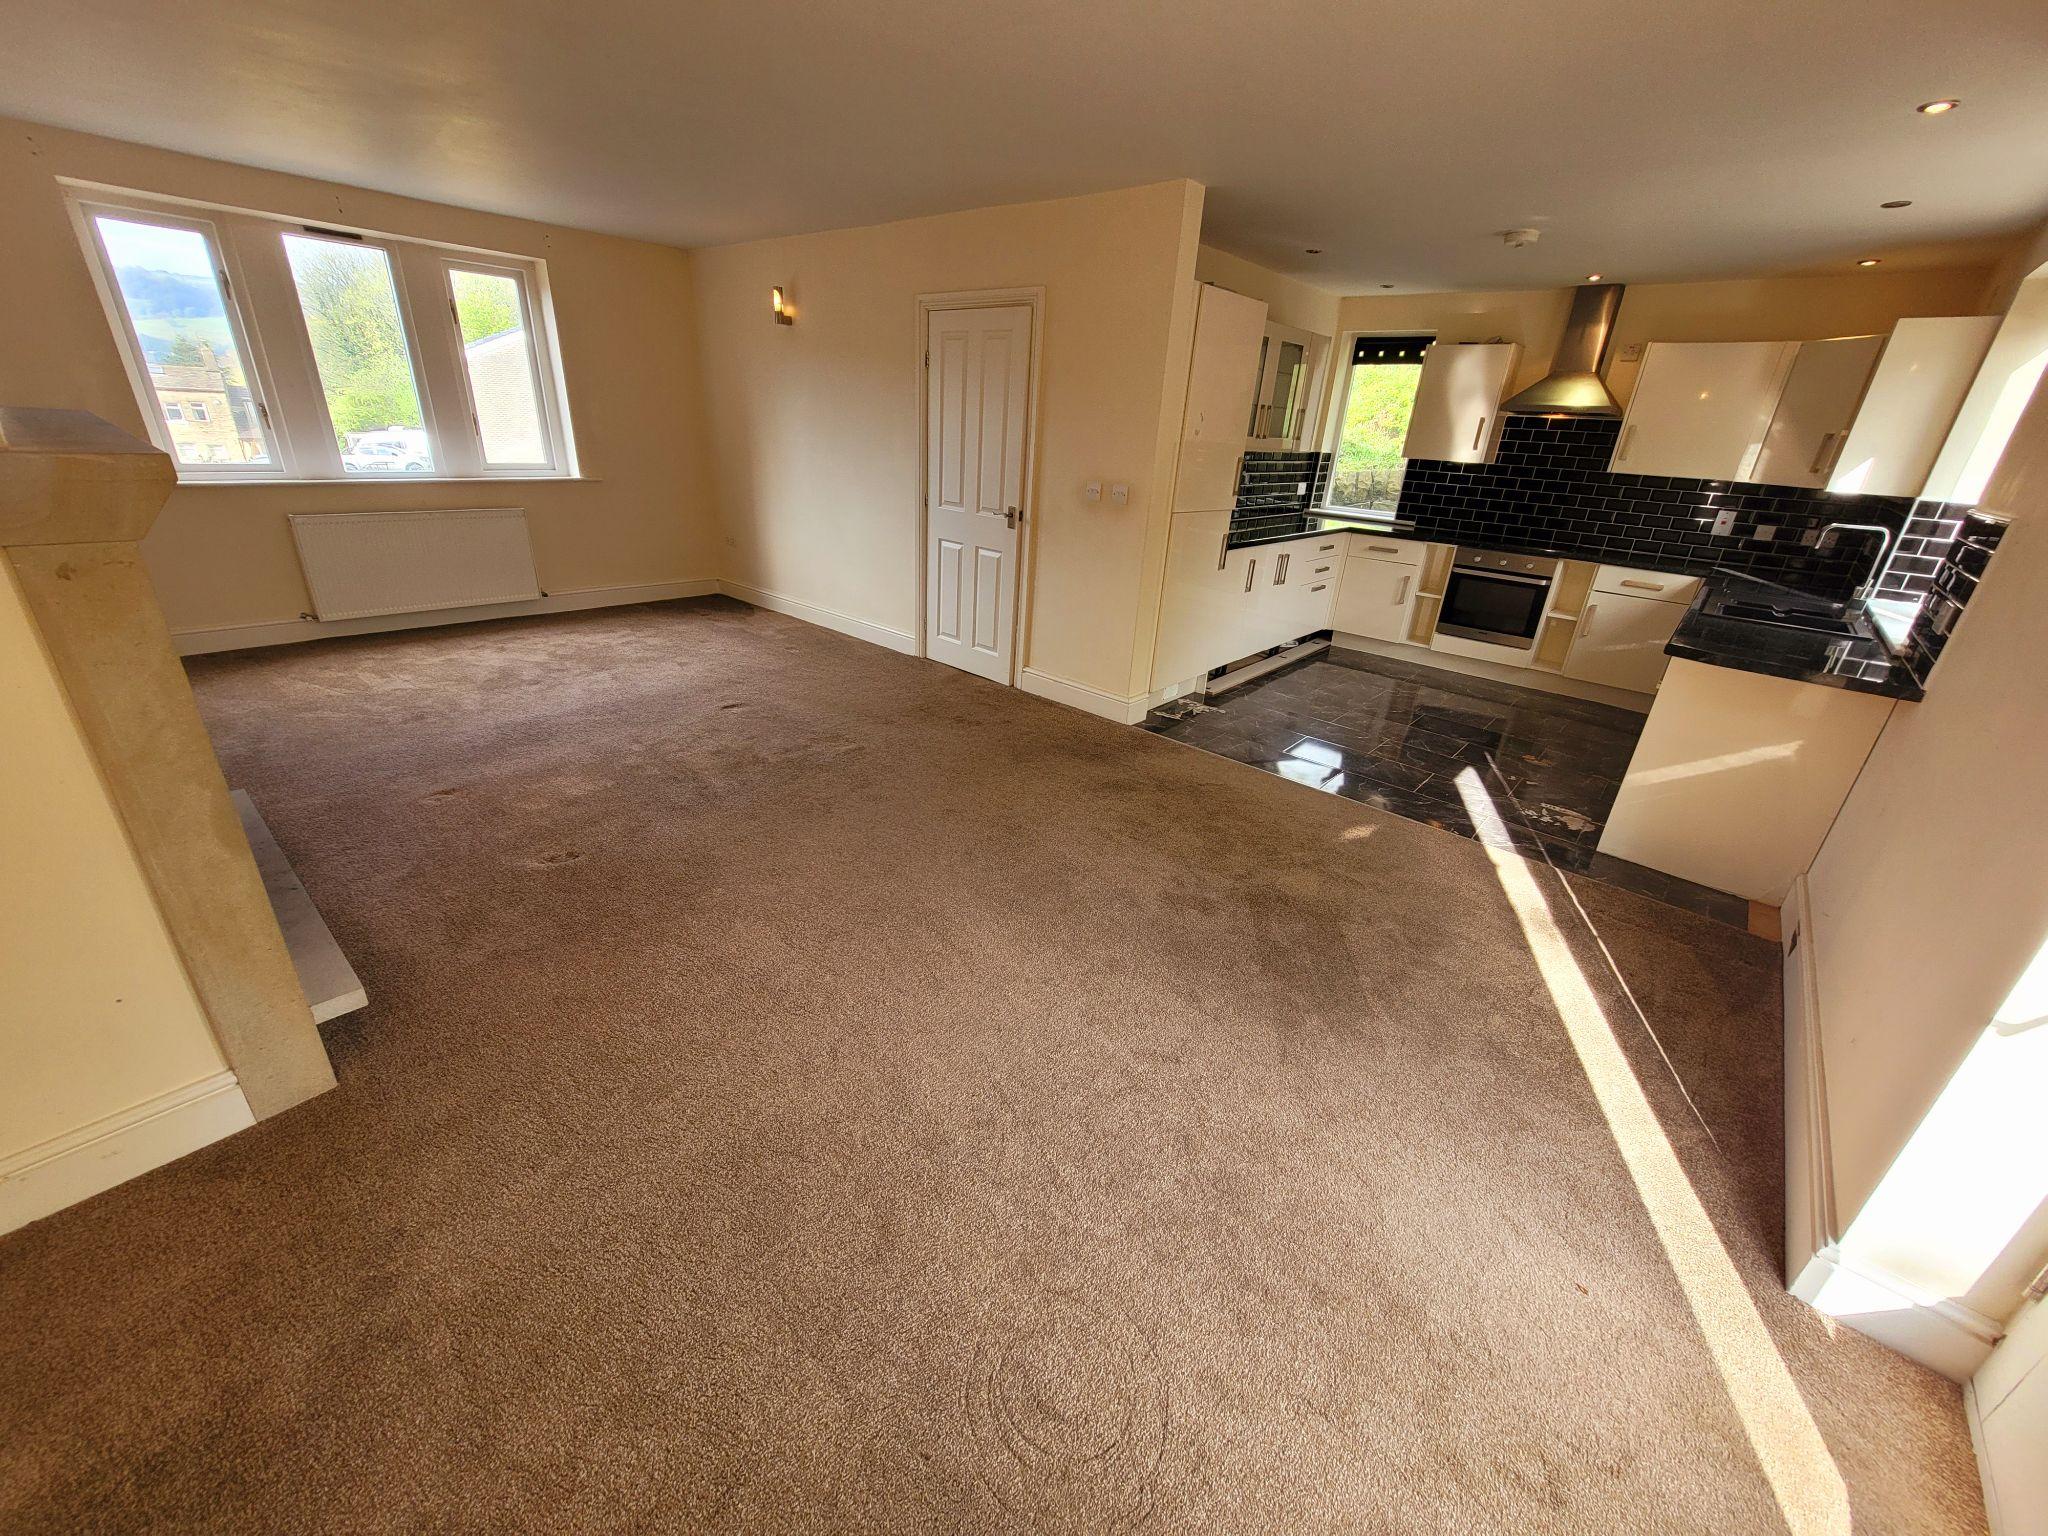 3 bedroom detached house For Sale in Hebden Bridge - Property photograph